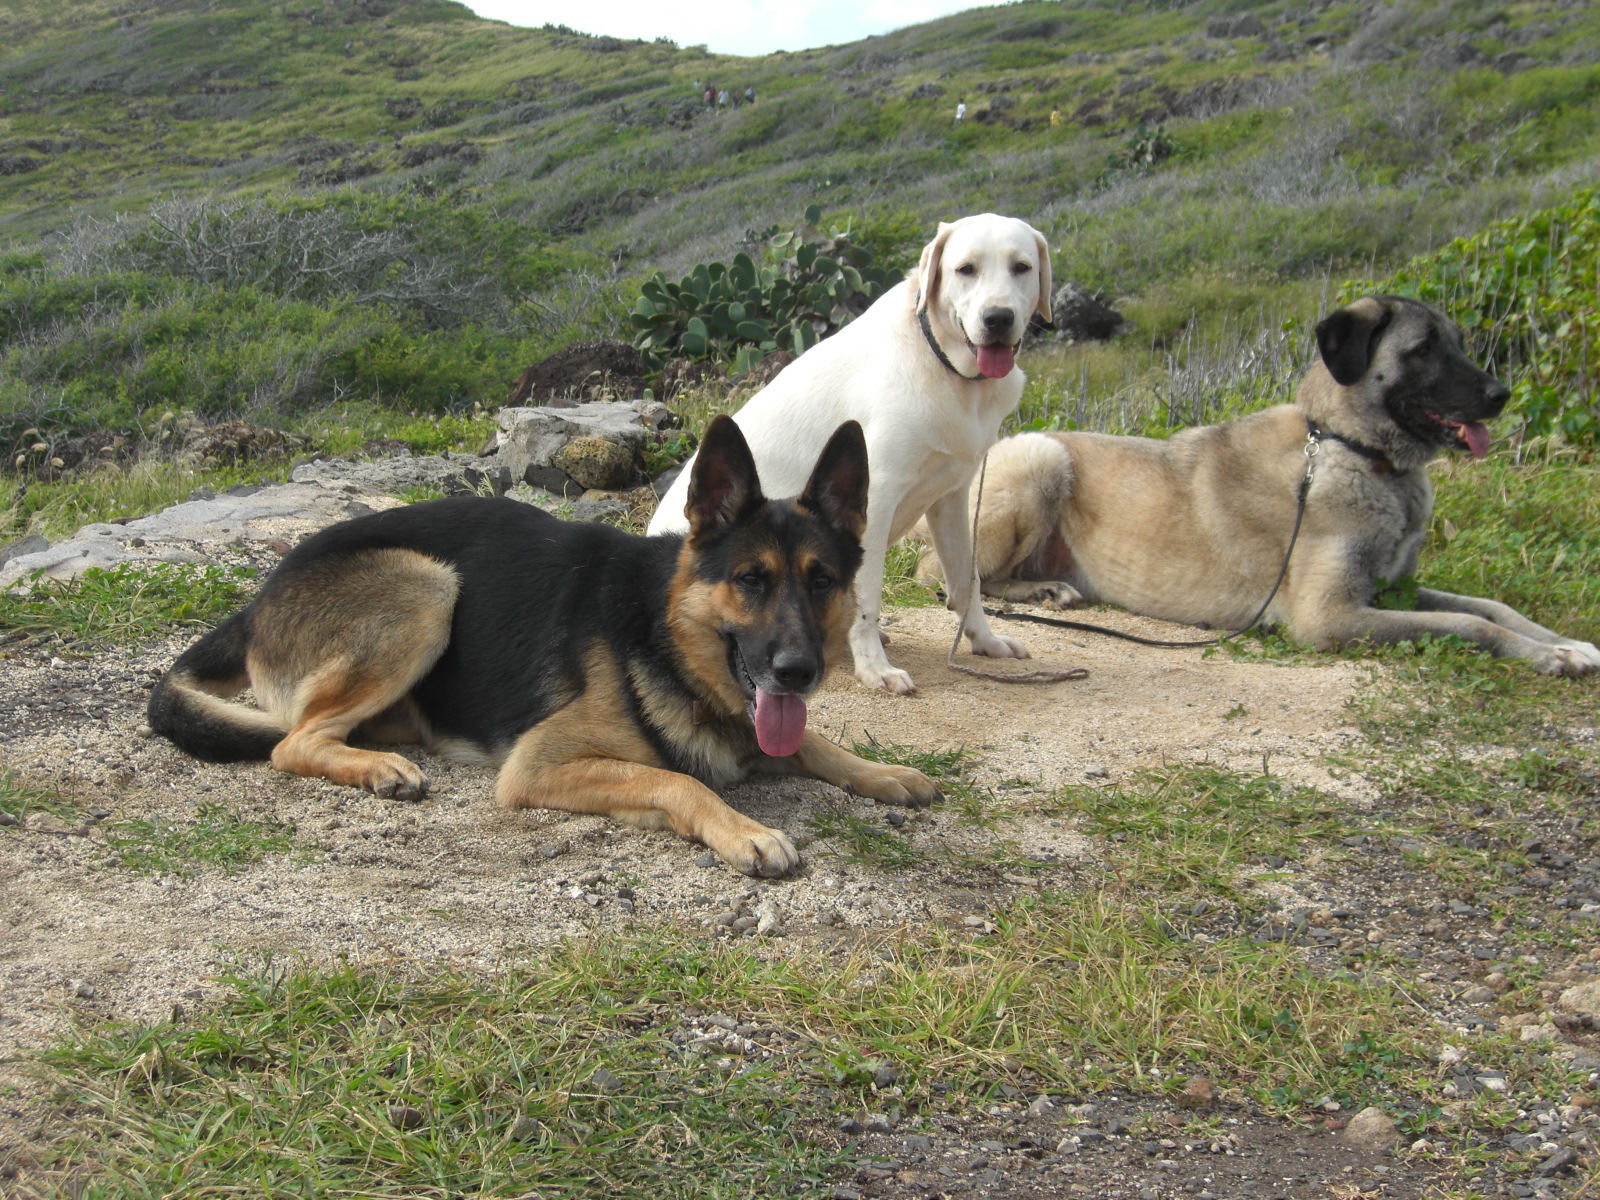 Anatolian Shepherd Dogs group wallpaper